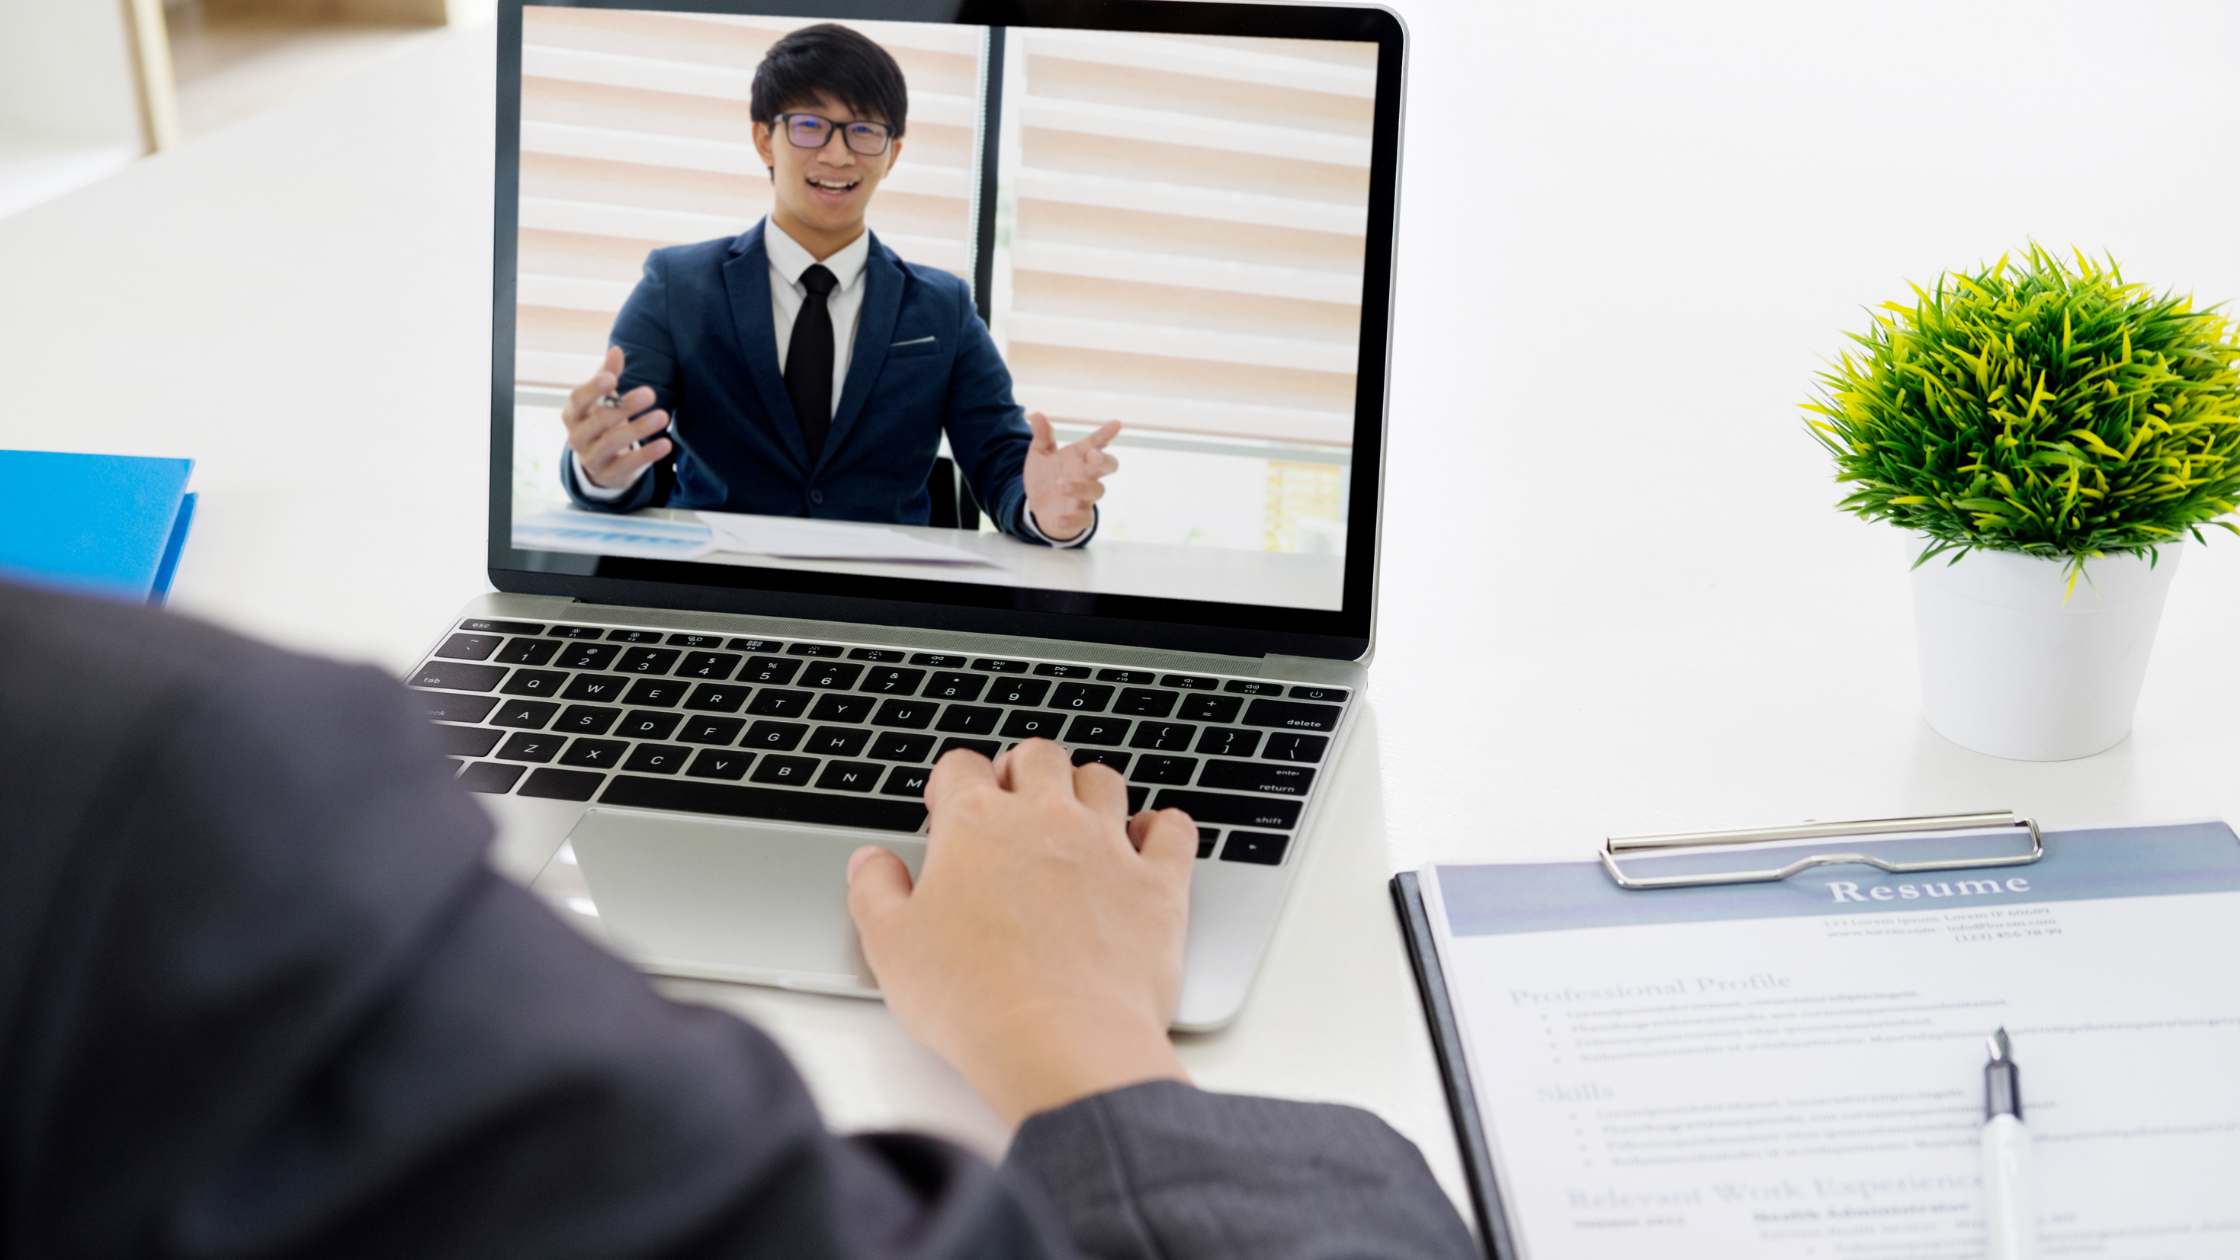 Remote job interview questions